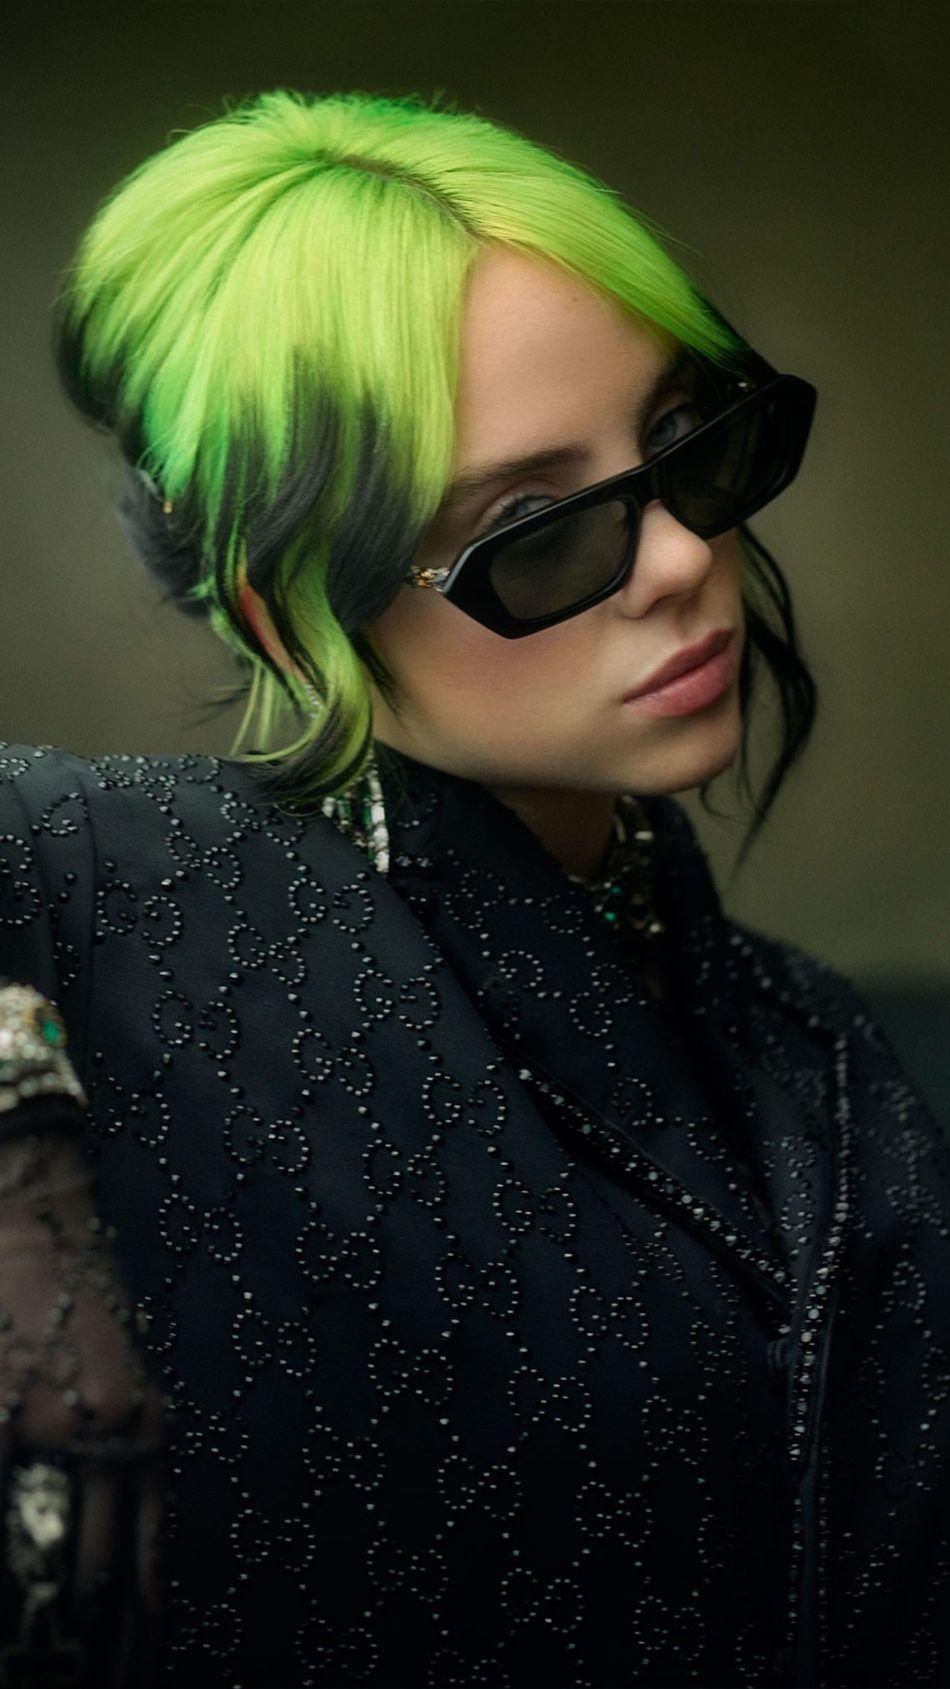 Singer Billie Eilish Green Hair 4k Ultra Hd Mobile Wallpaper In 2020 Billie Eilish Billie Green Hair